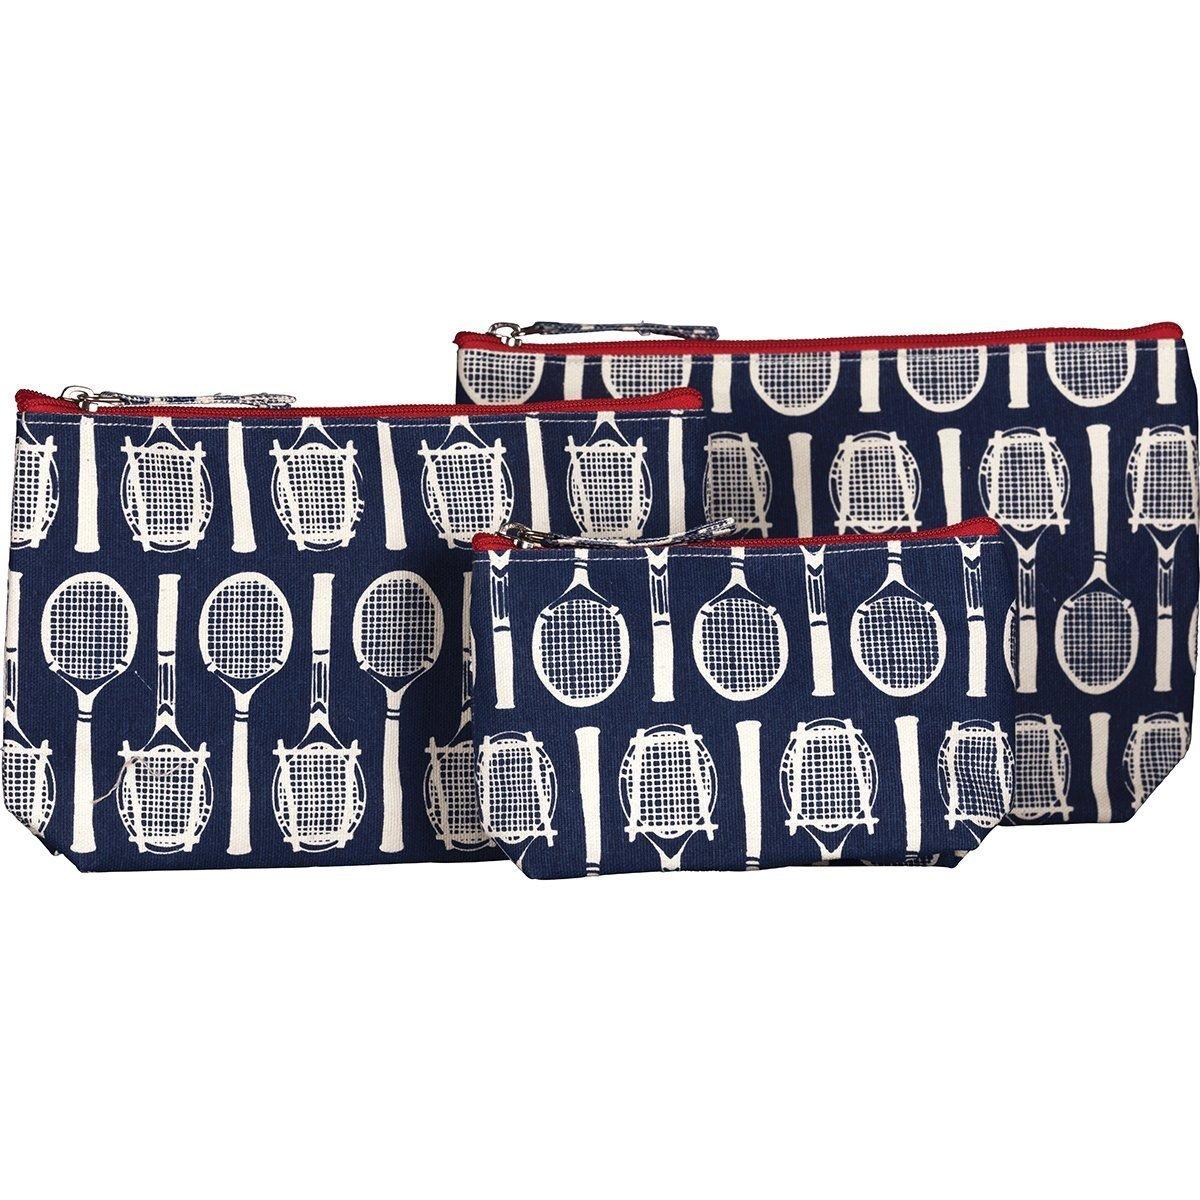 Rockflowerpaper Wimbledon Tennis Navy Canvas Cosmetic Makeup And Travel Bags Set Of 3